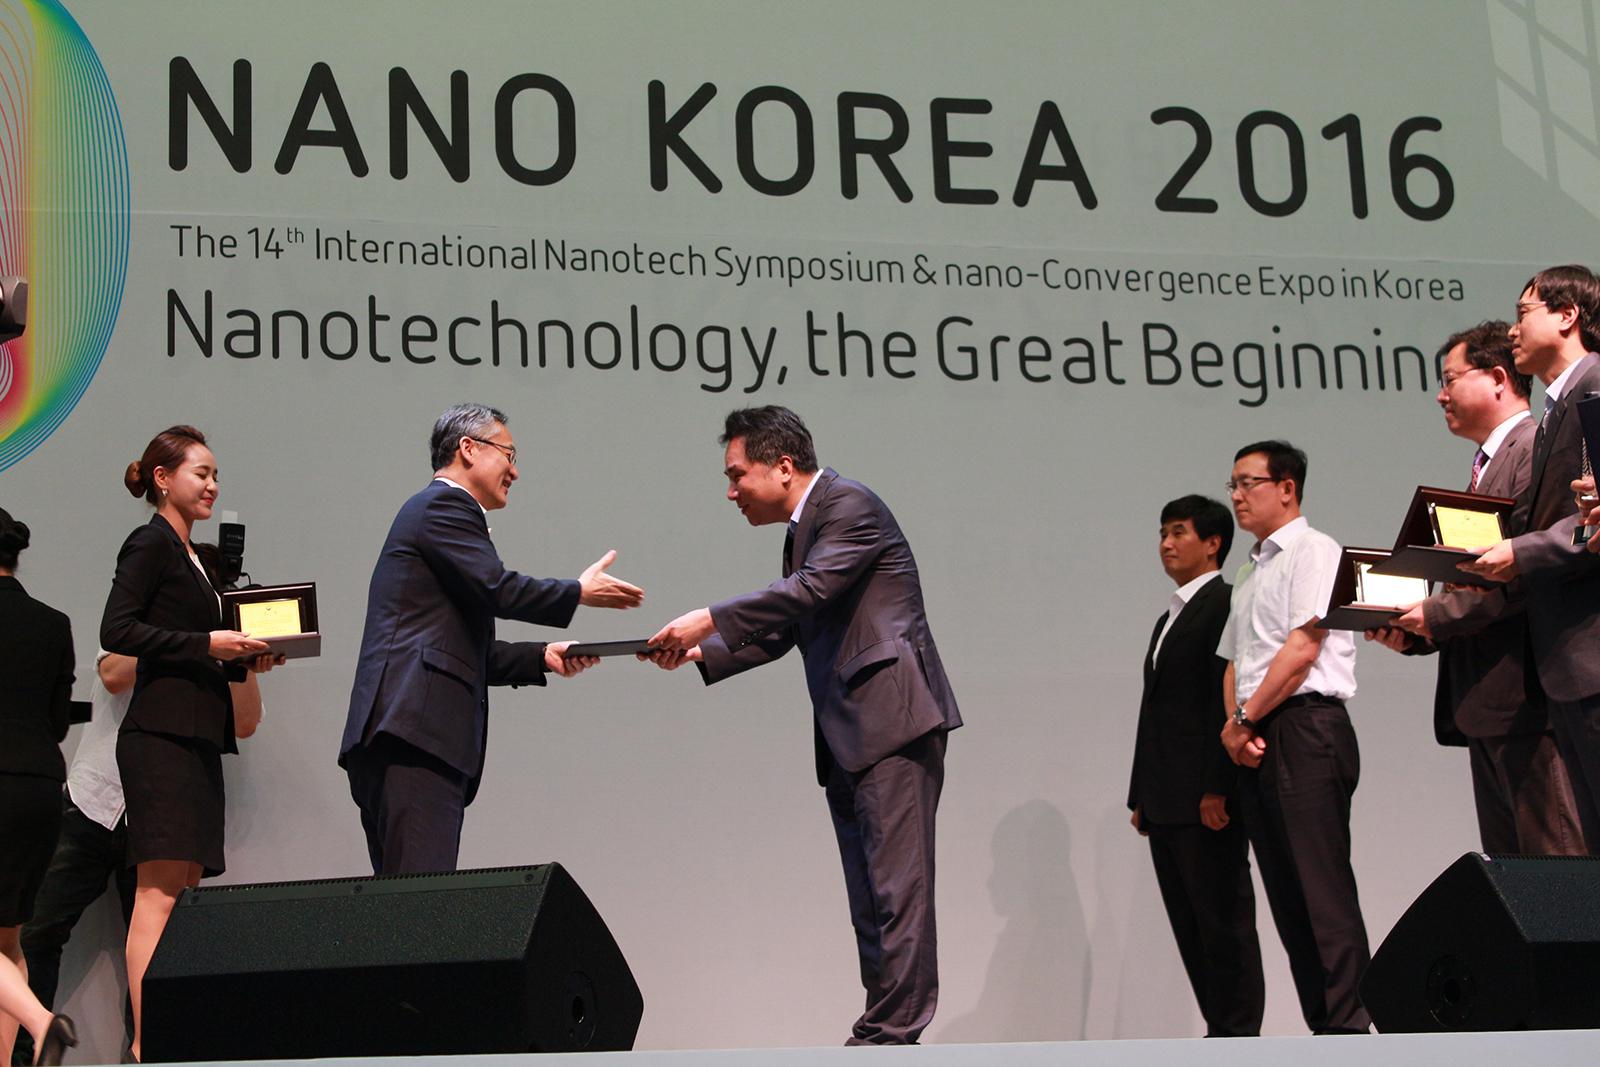 nanokorea2016